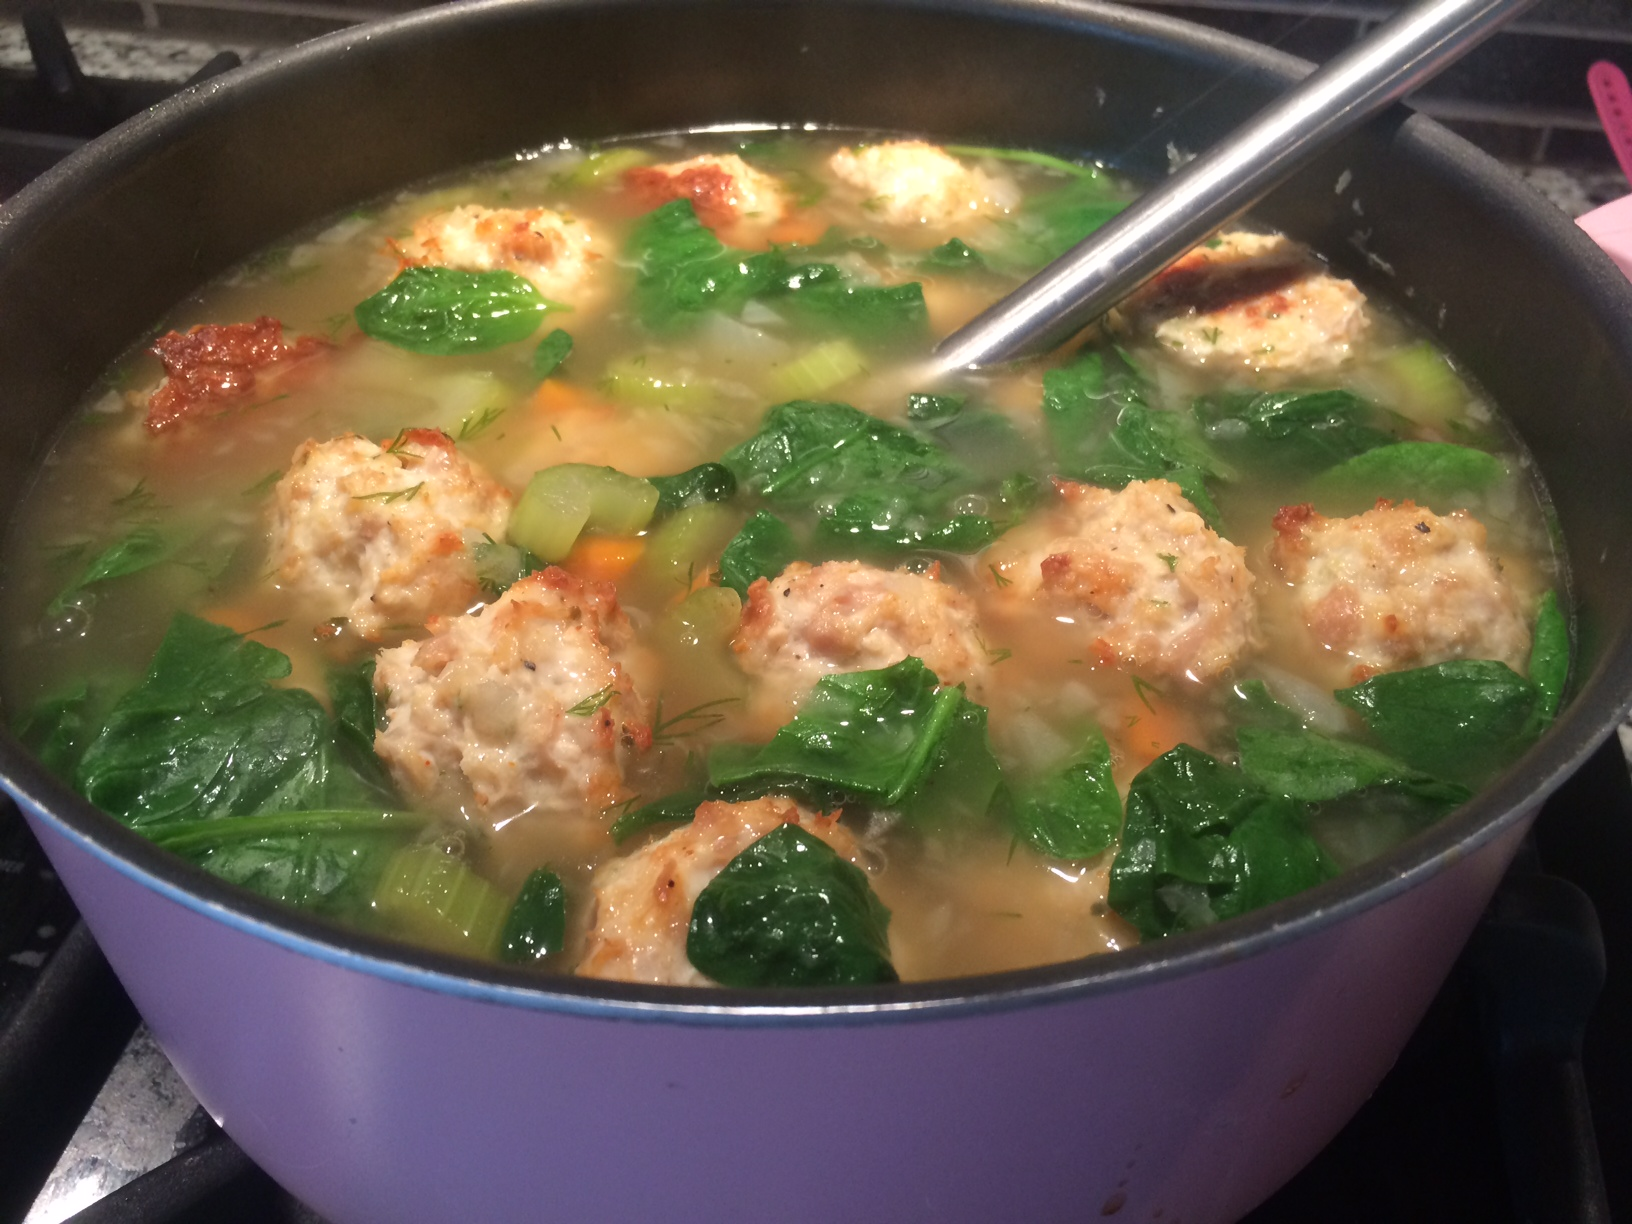 Italian Wedding Soup Recipe, Easy Italian Wedding Soup Recipe, Homemade Italian Wedding Soup Recipe